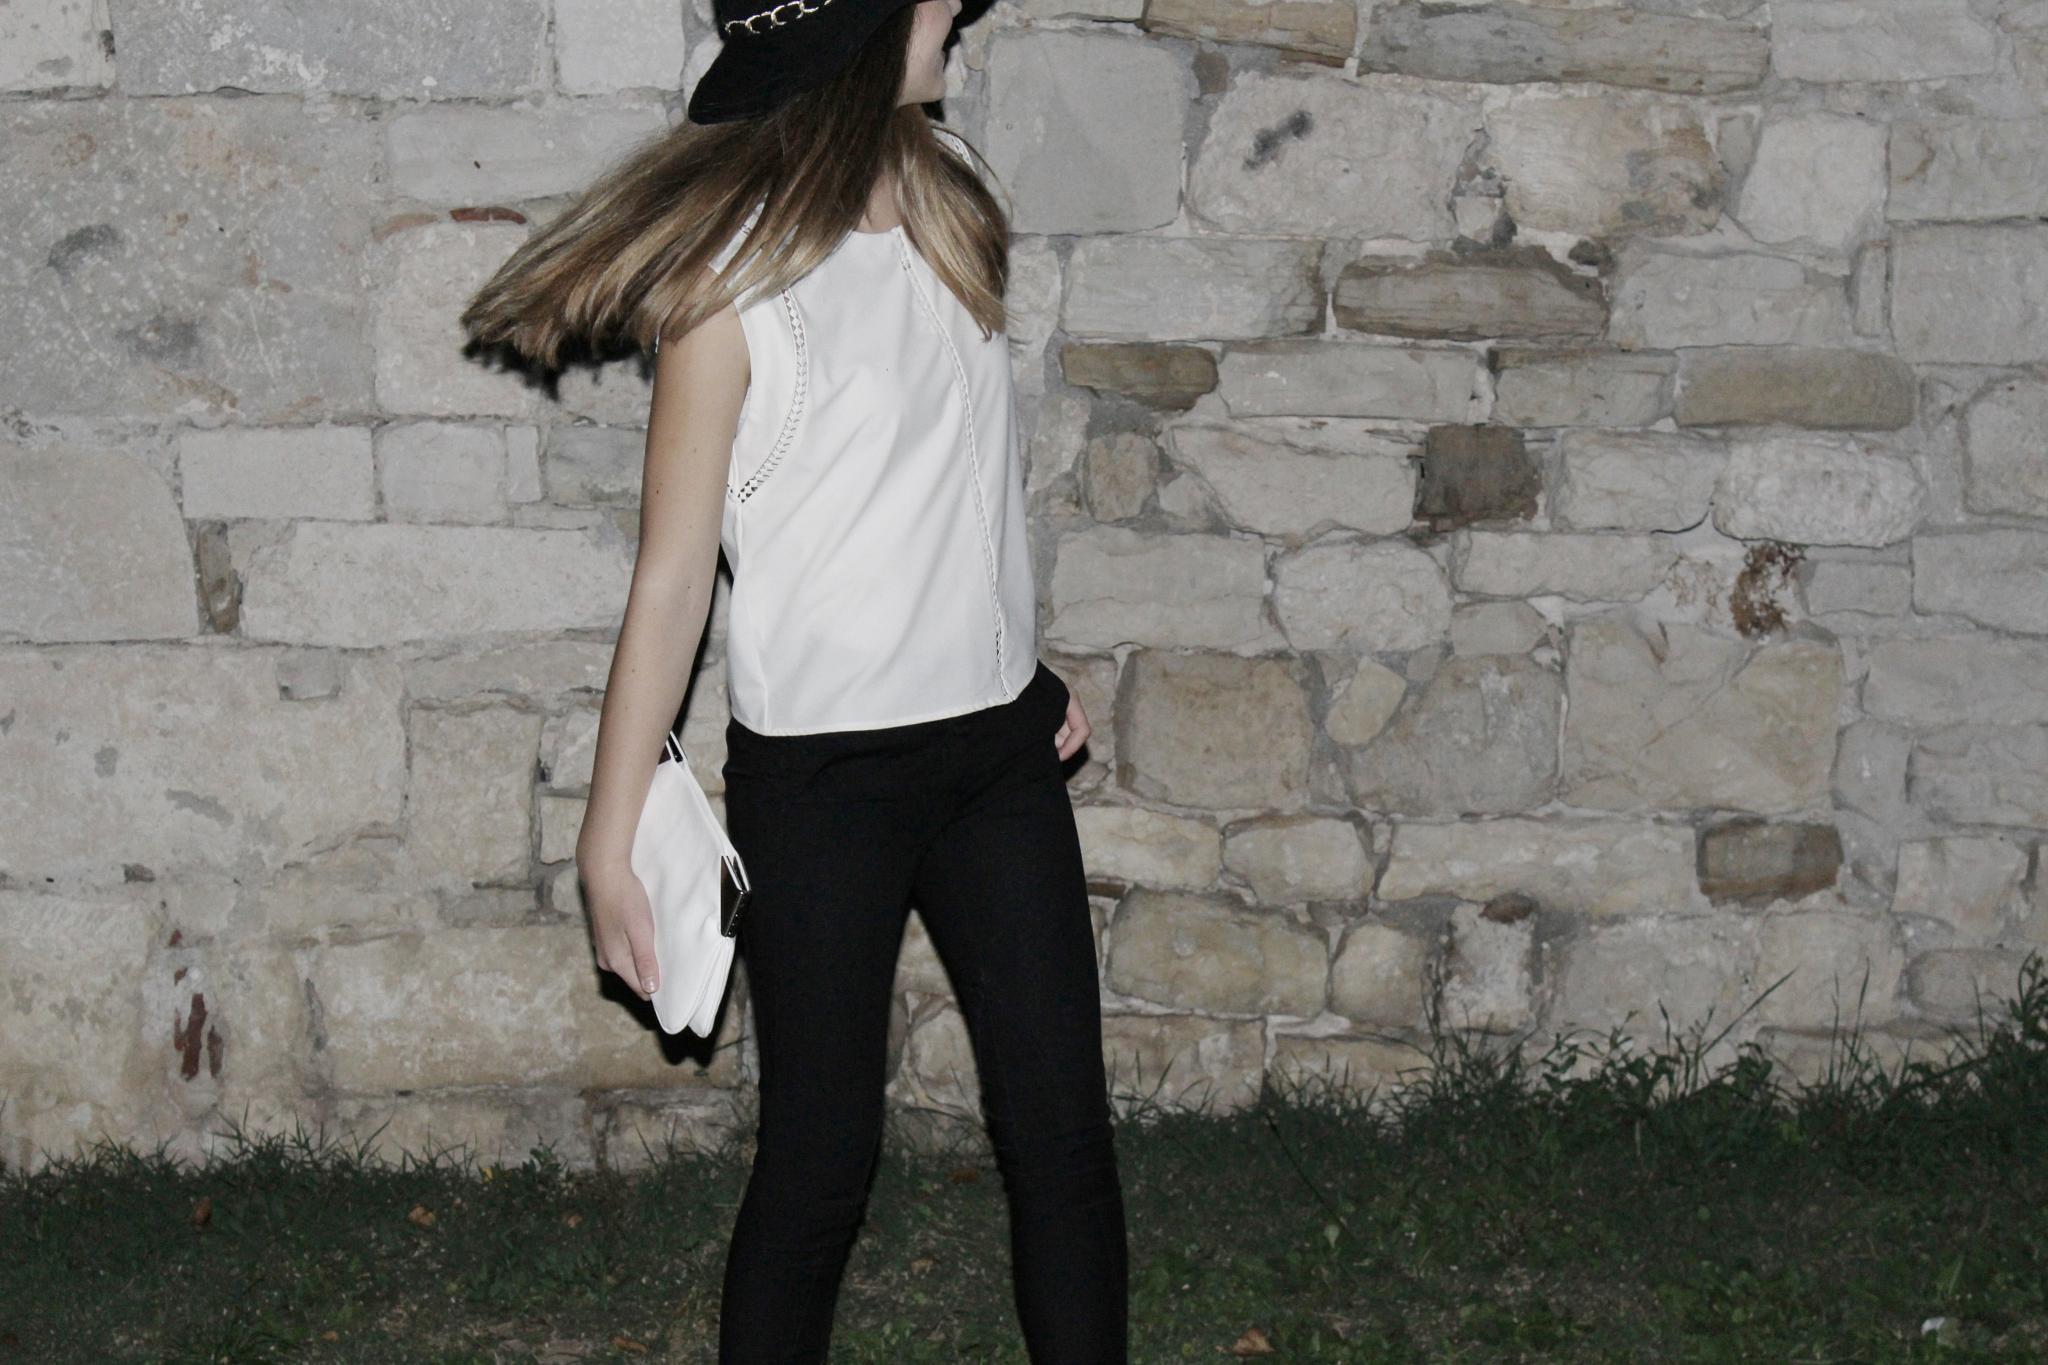 Night by PBphotoblog